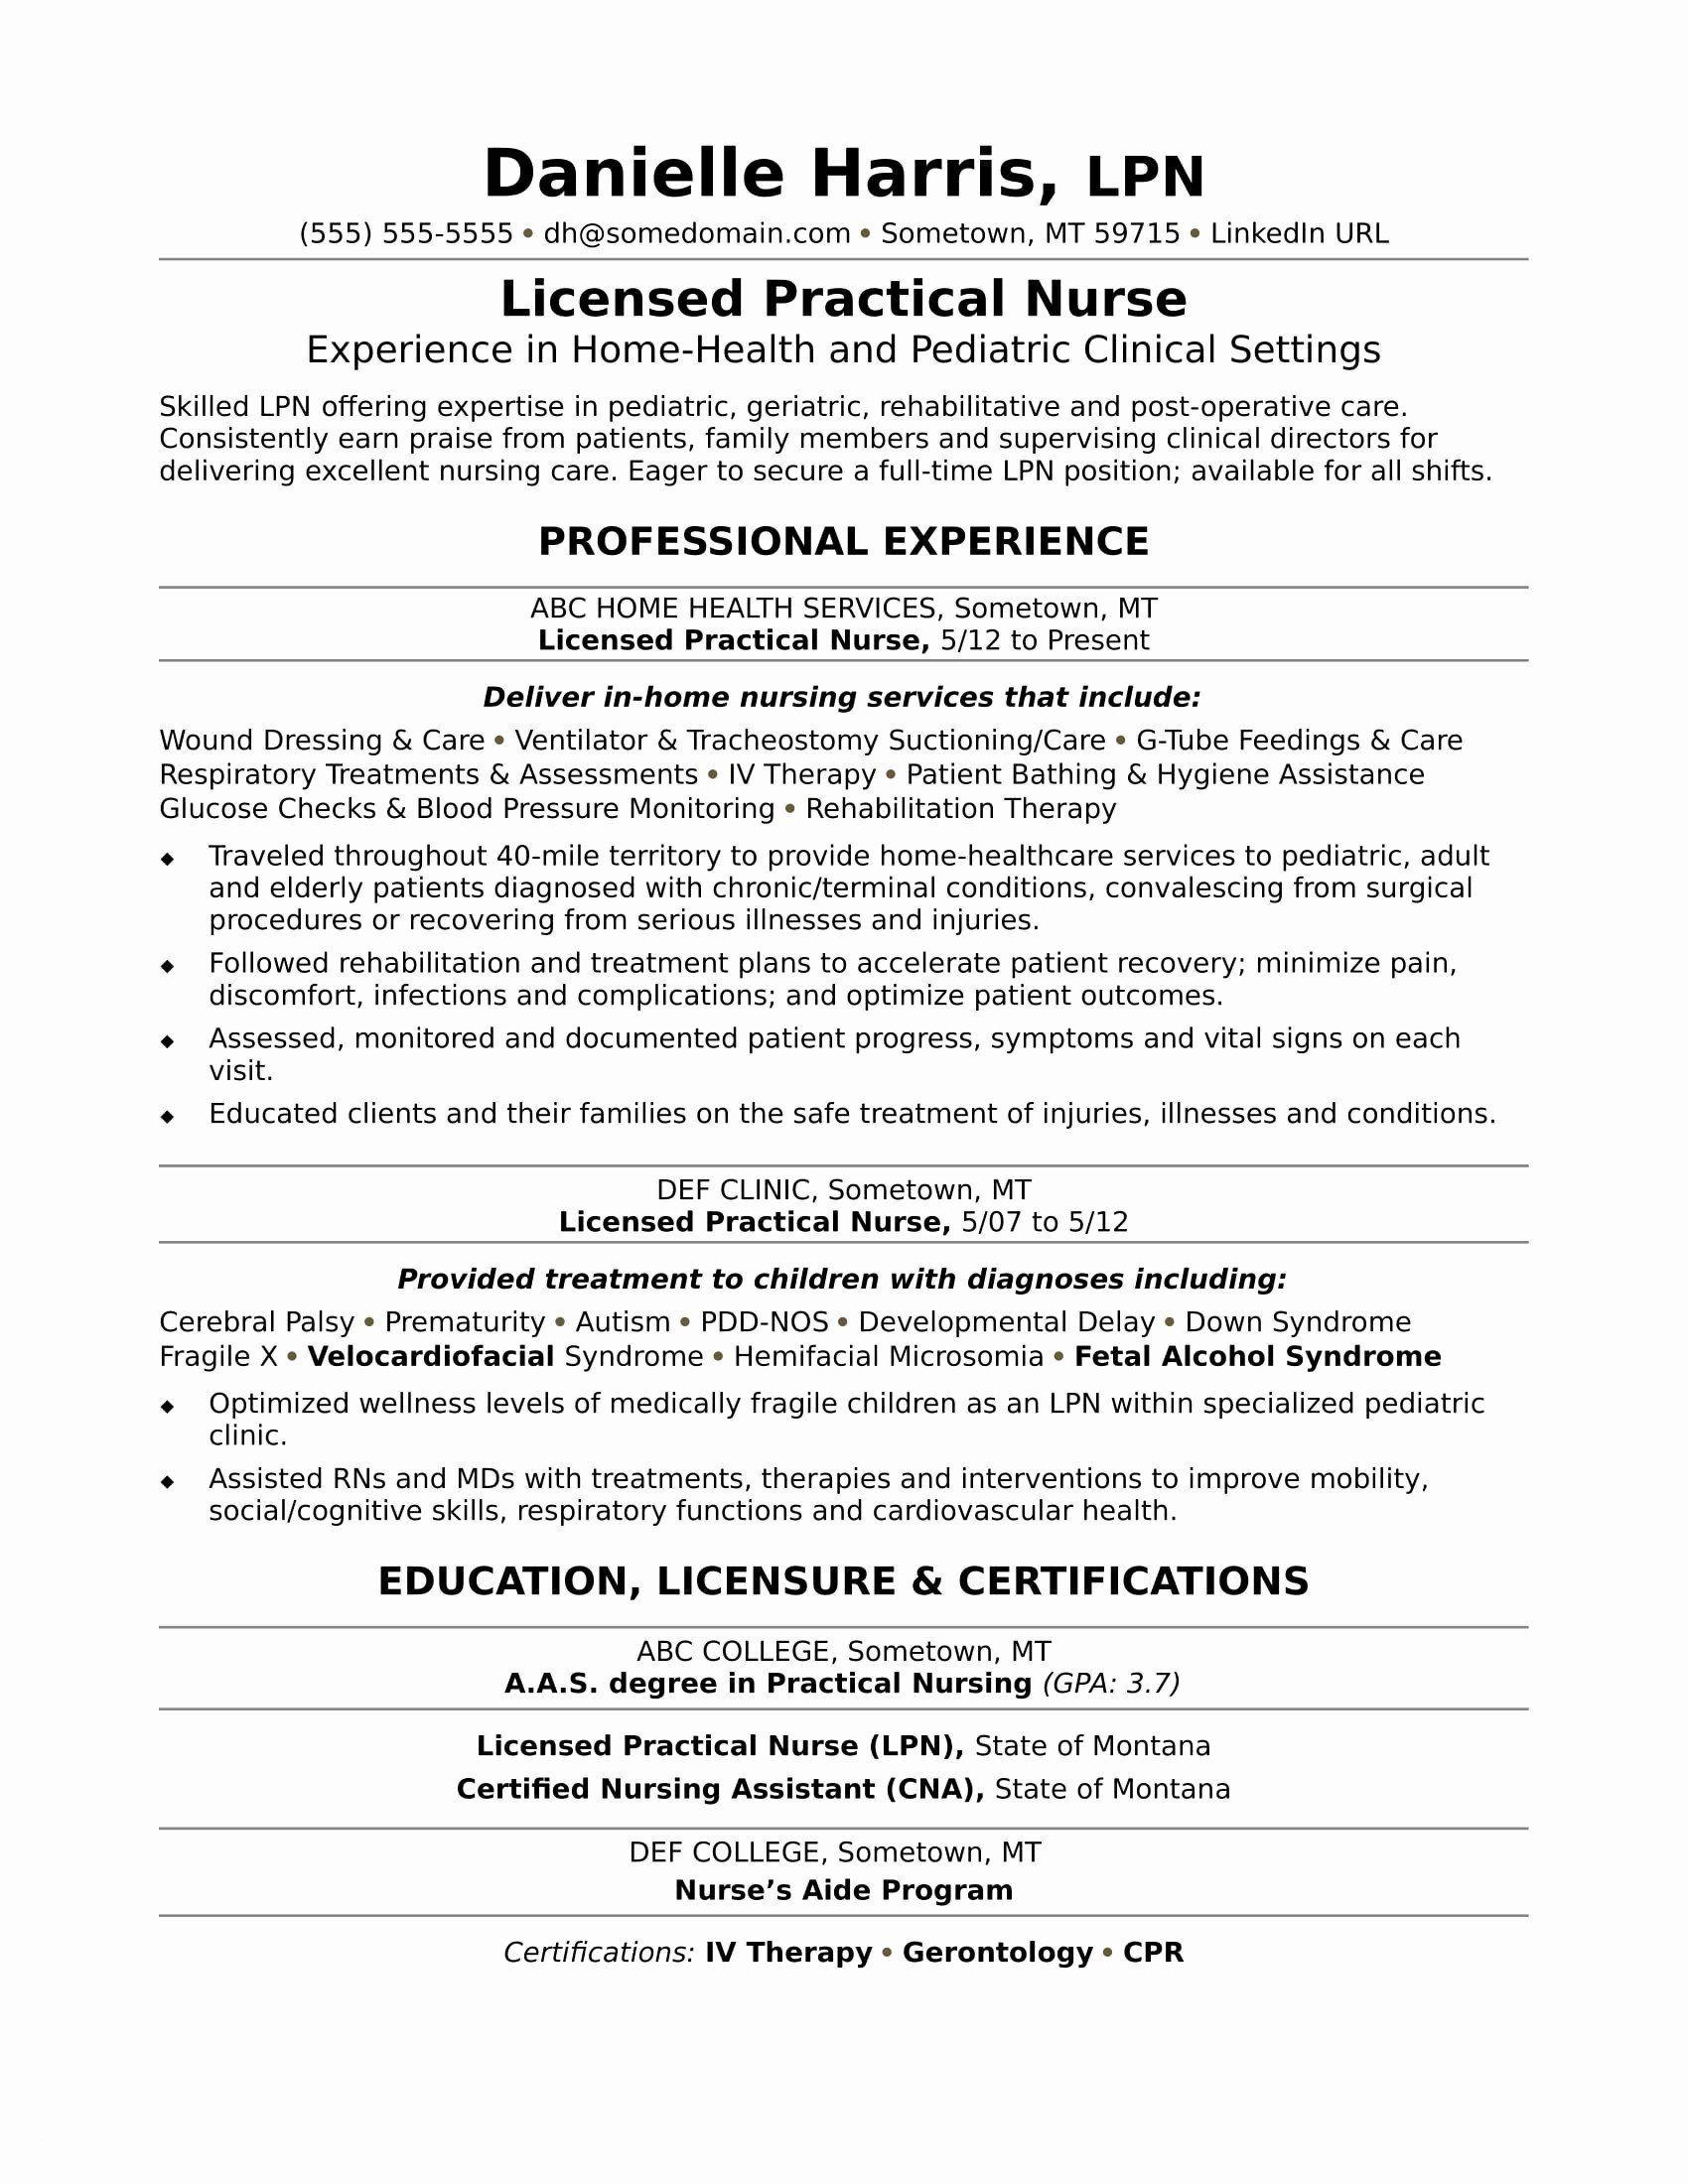 Starbucks Barista Job Description For Resume Beautiful Job Description Examples Barista Nursing Resume Examples New Grad Nursing Resume Nursing Resume Template